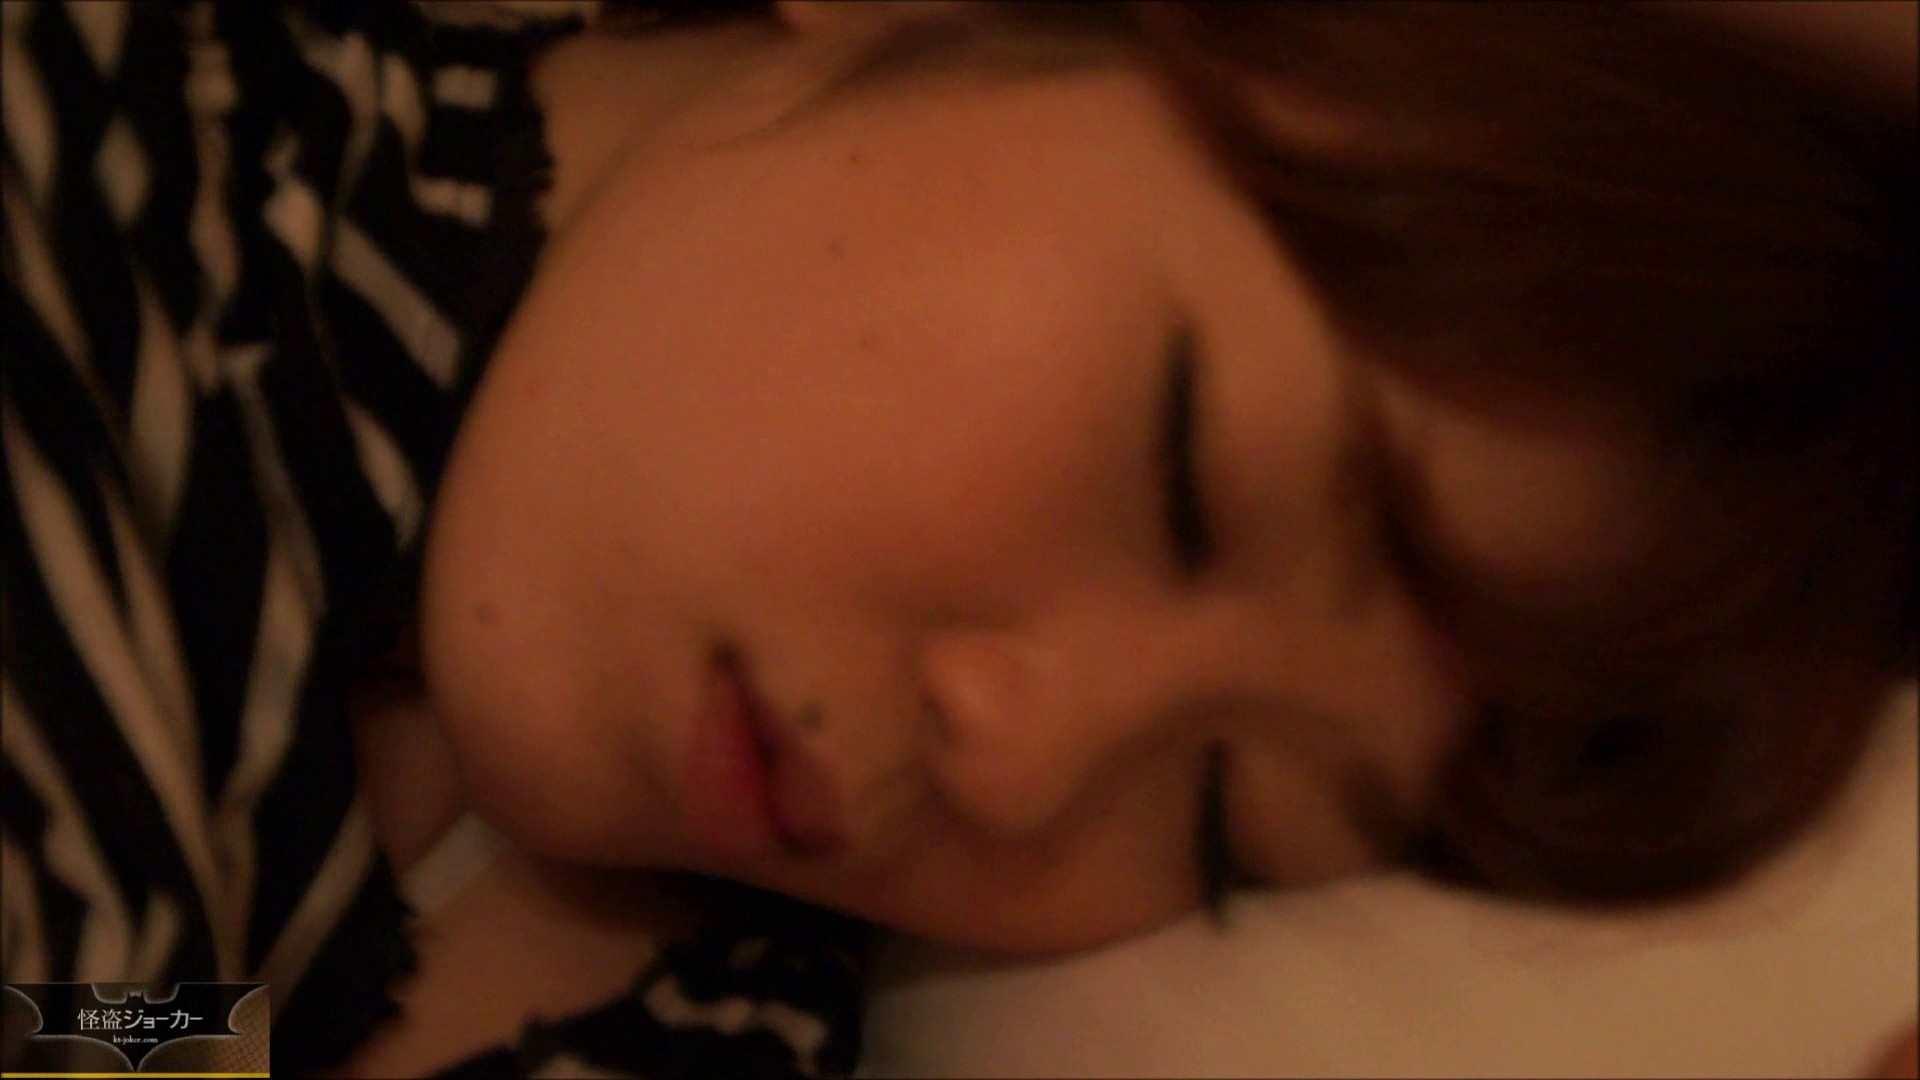 vol.4【白衣の天使23歳】☆のりこちゃん☆ホテルお持ち帰り。朦朧のまま感じて 美肌  109画像 65